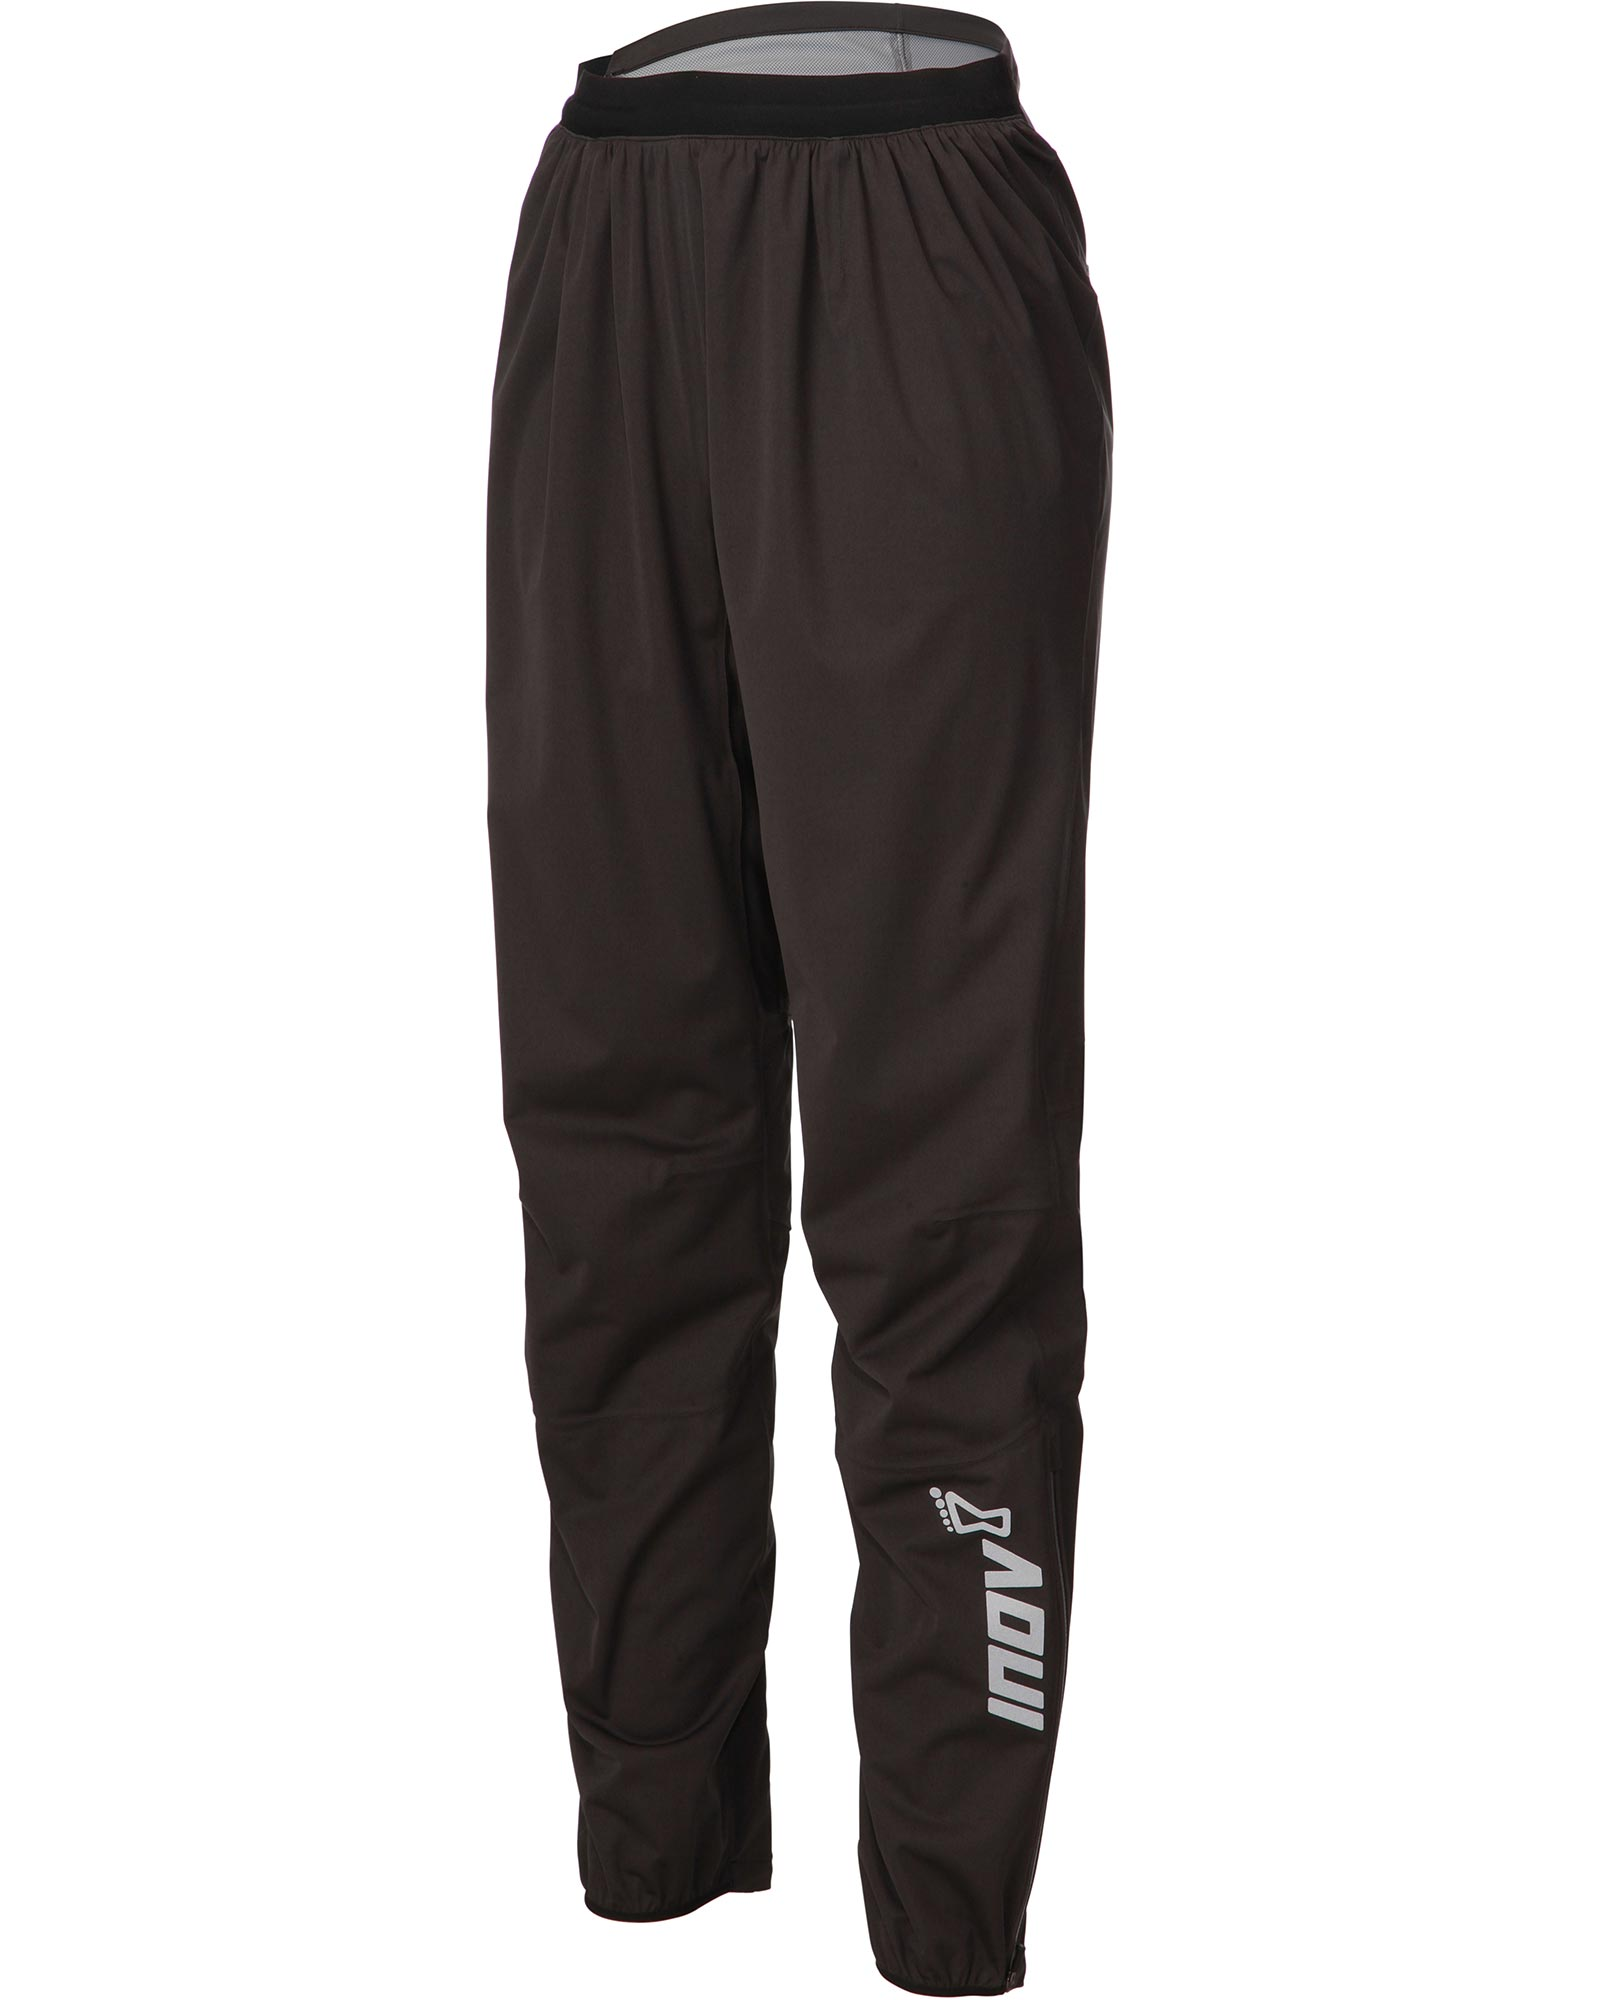 Inov-8 Women's Trail Pants 0